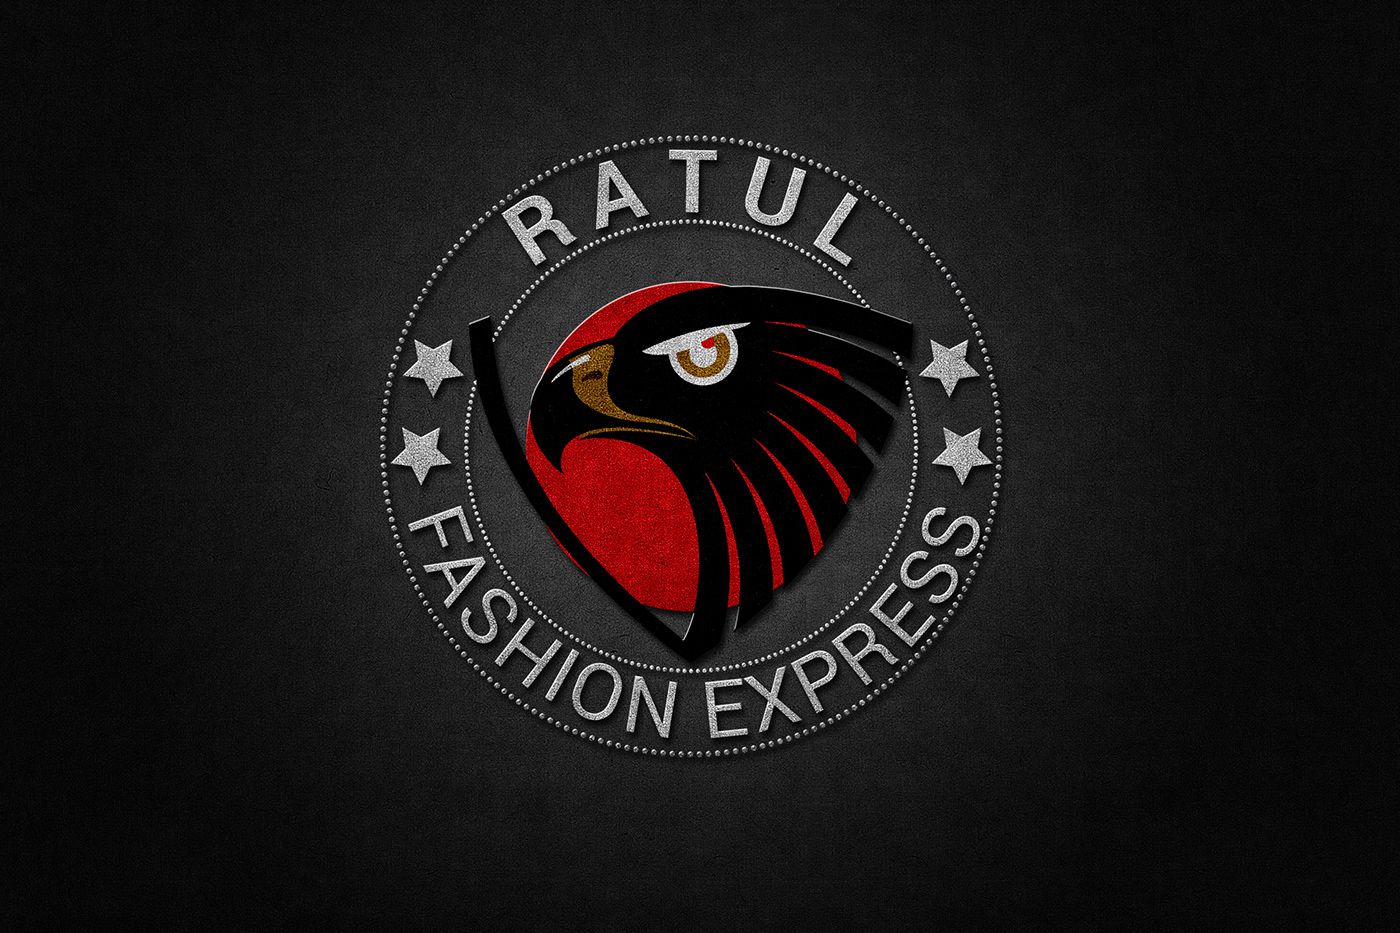 logo Logo Design ratul logo Rezuanul islam roni roni update logo design Update logo design